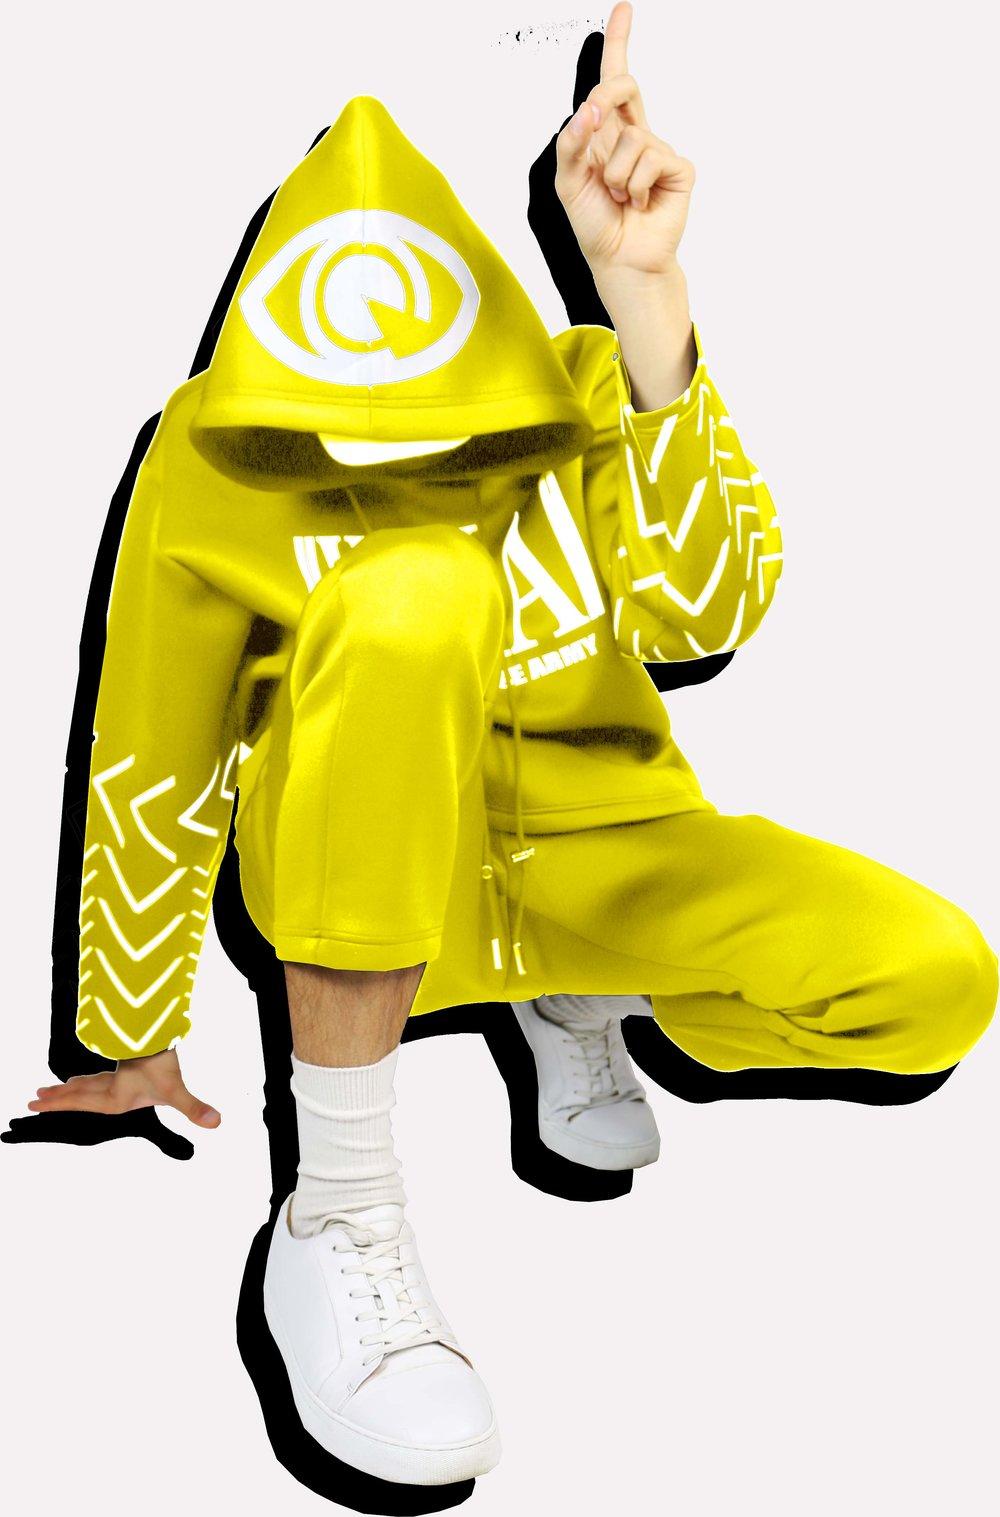 Neon Yellow %22HighLIGHT%22.jpg